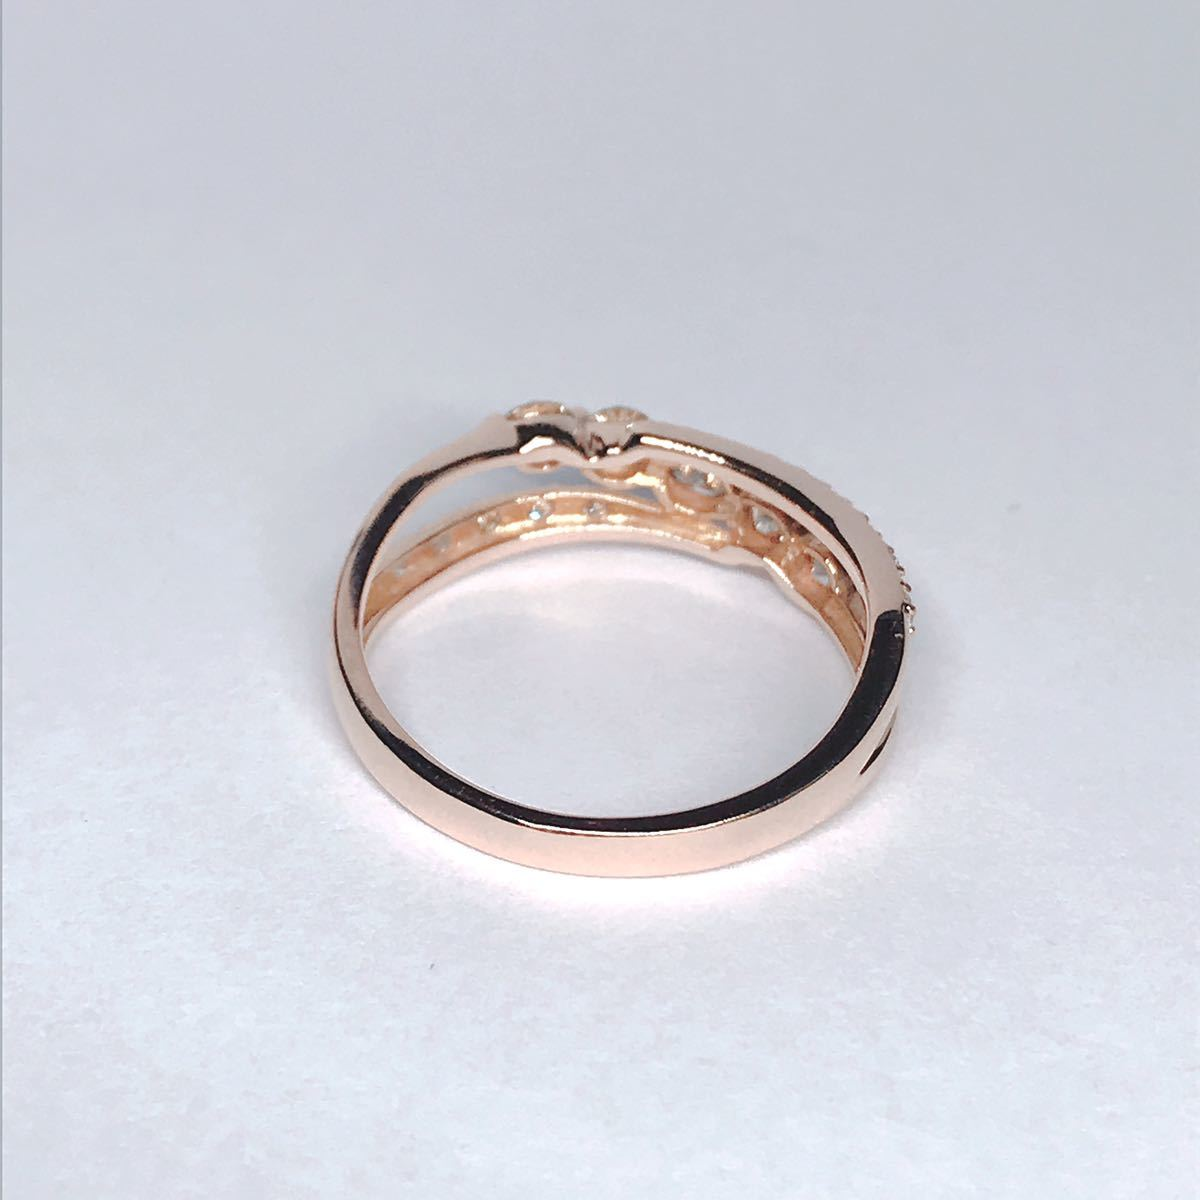 0.50ct ダイヤモンドリング K18 ダイヤ ウェーブ ミル打ち 上品 幅広_画像4